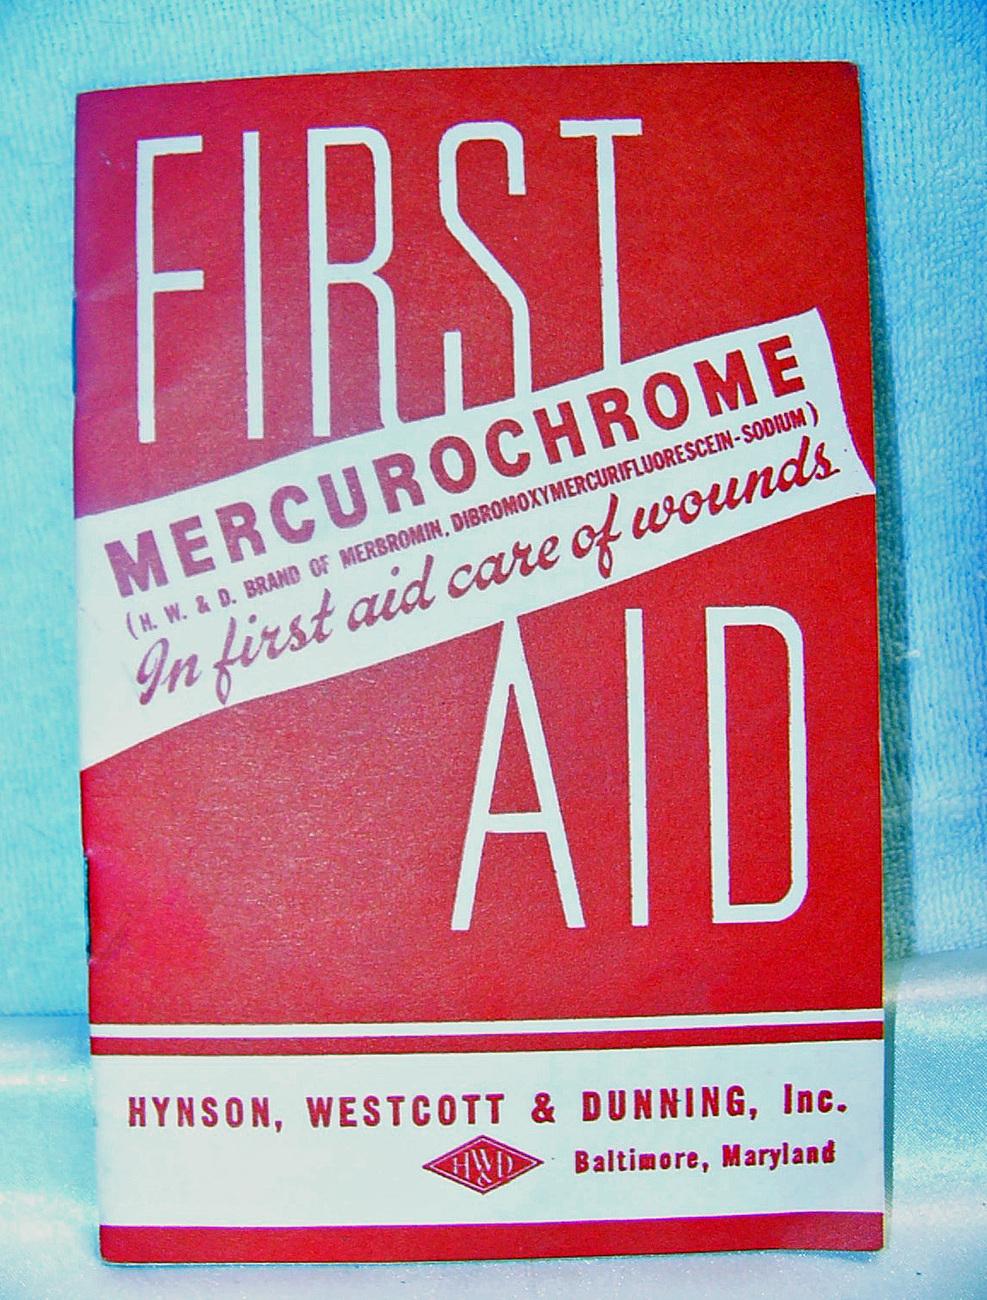 Mercurichrome book